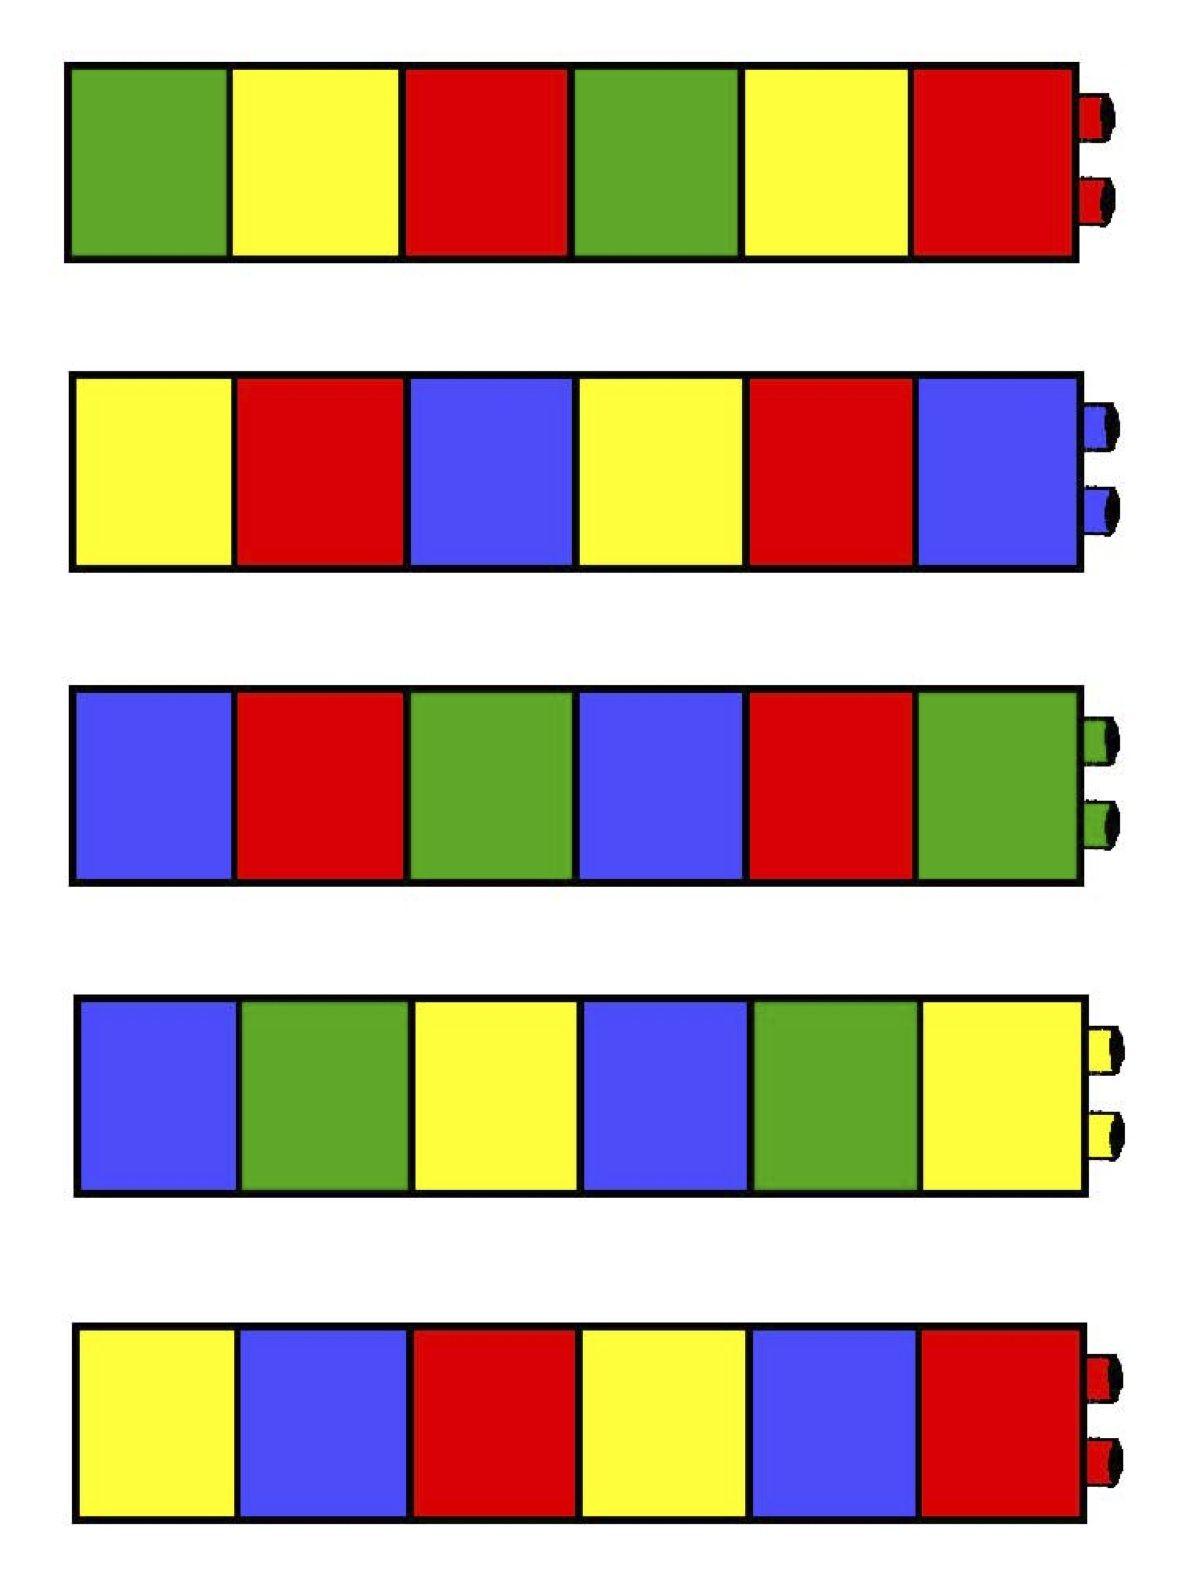 series con lego | atividades | Pinterest | Arbeitsblätter, Lego ...